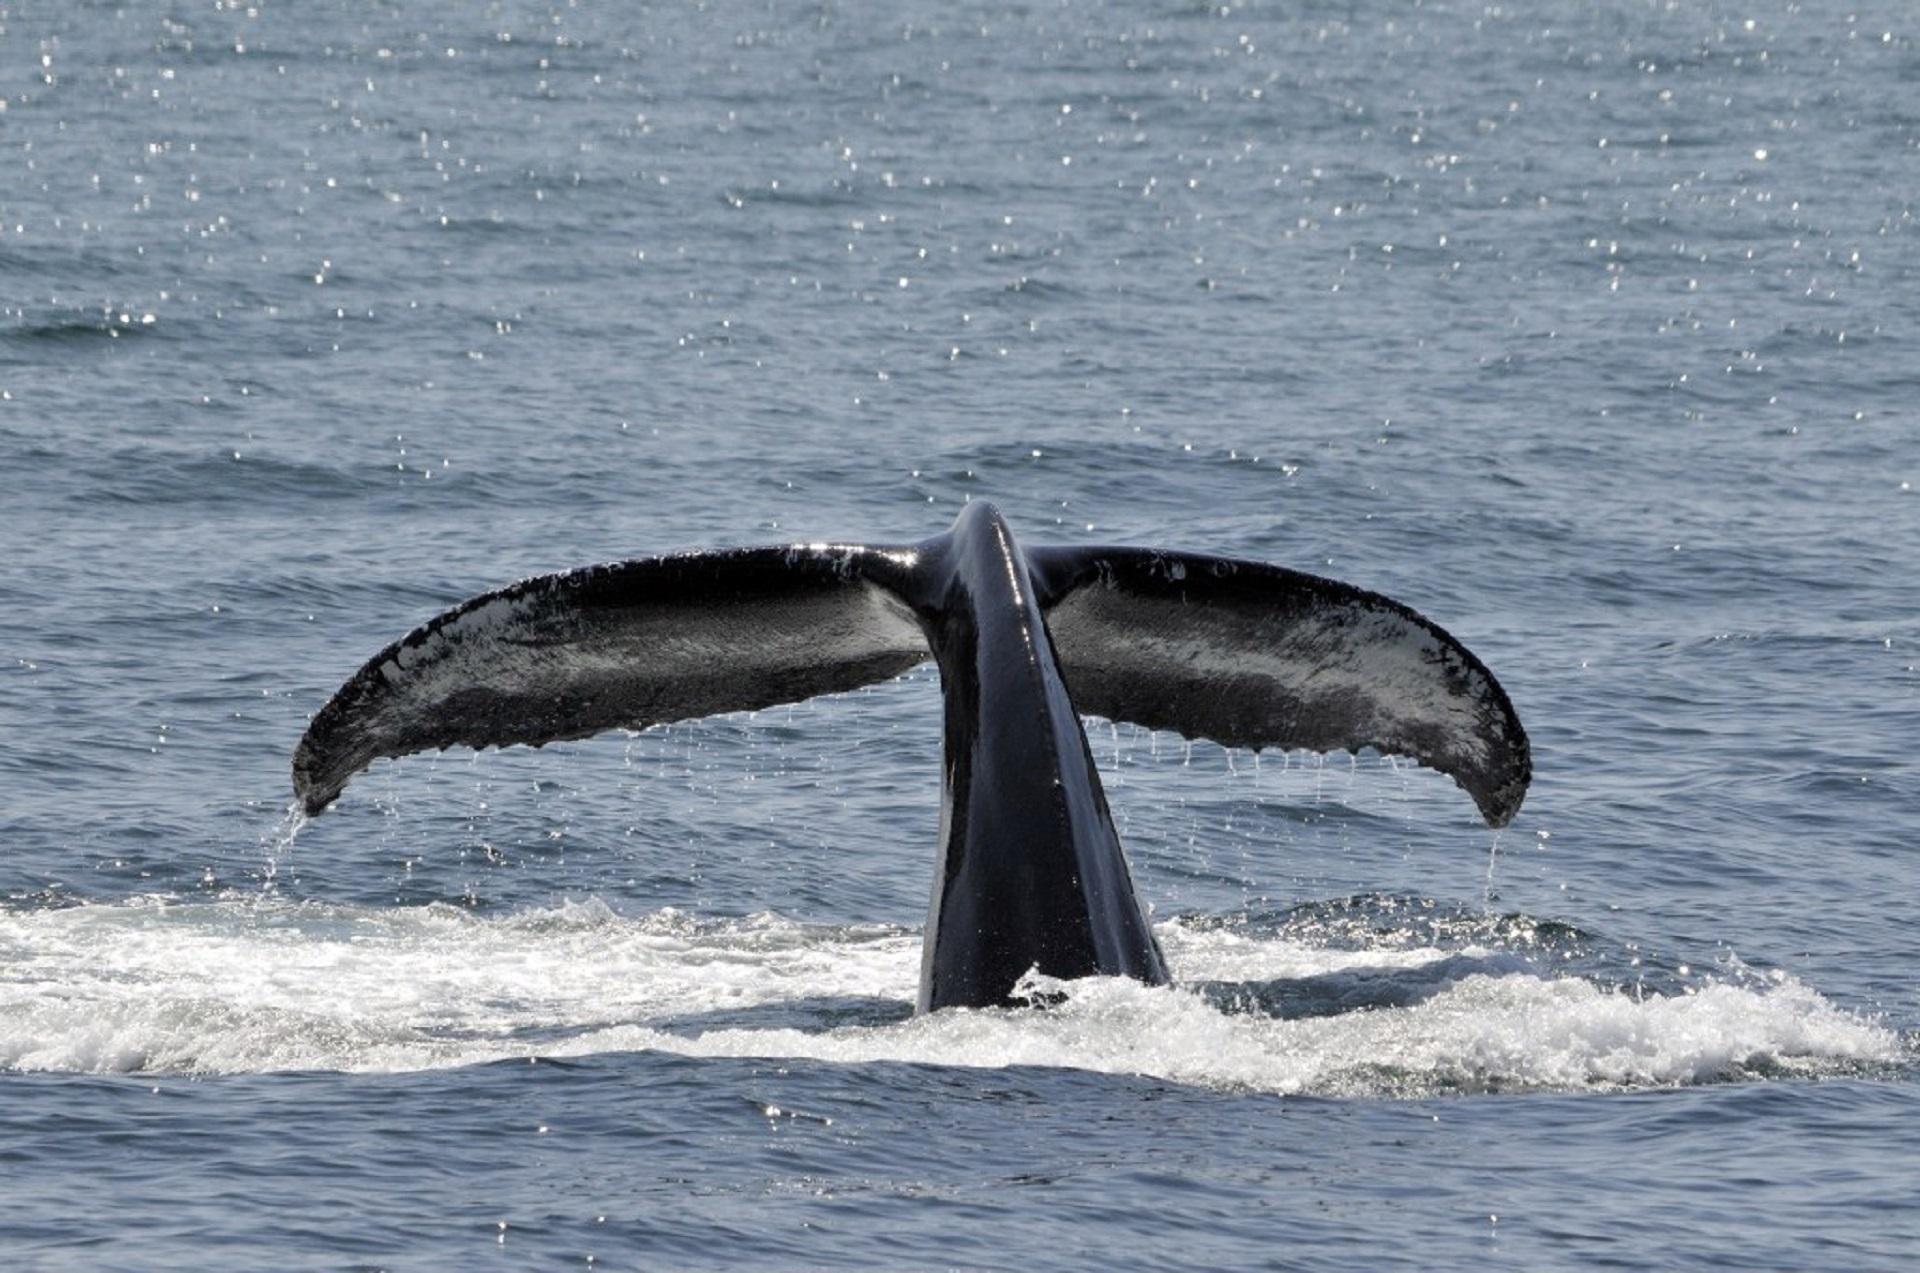 хвост кита картинки гениталии номерах это